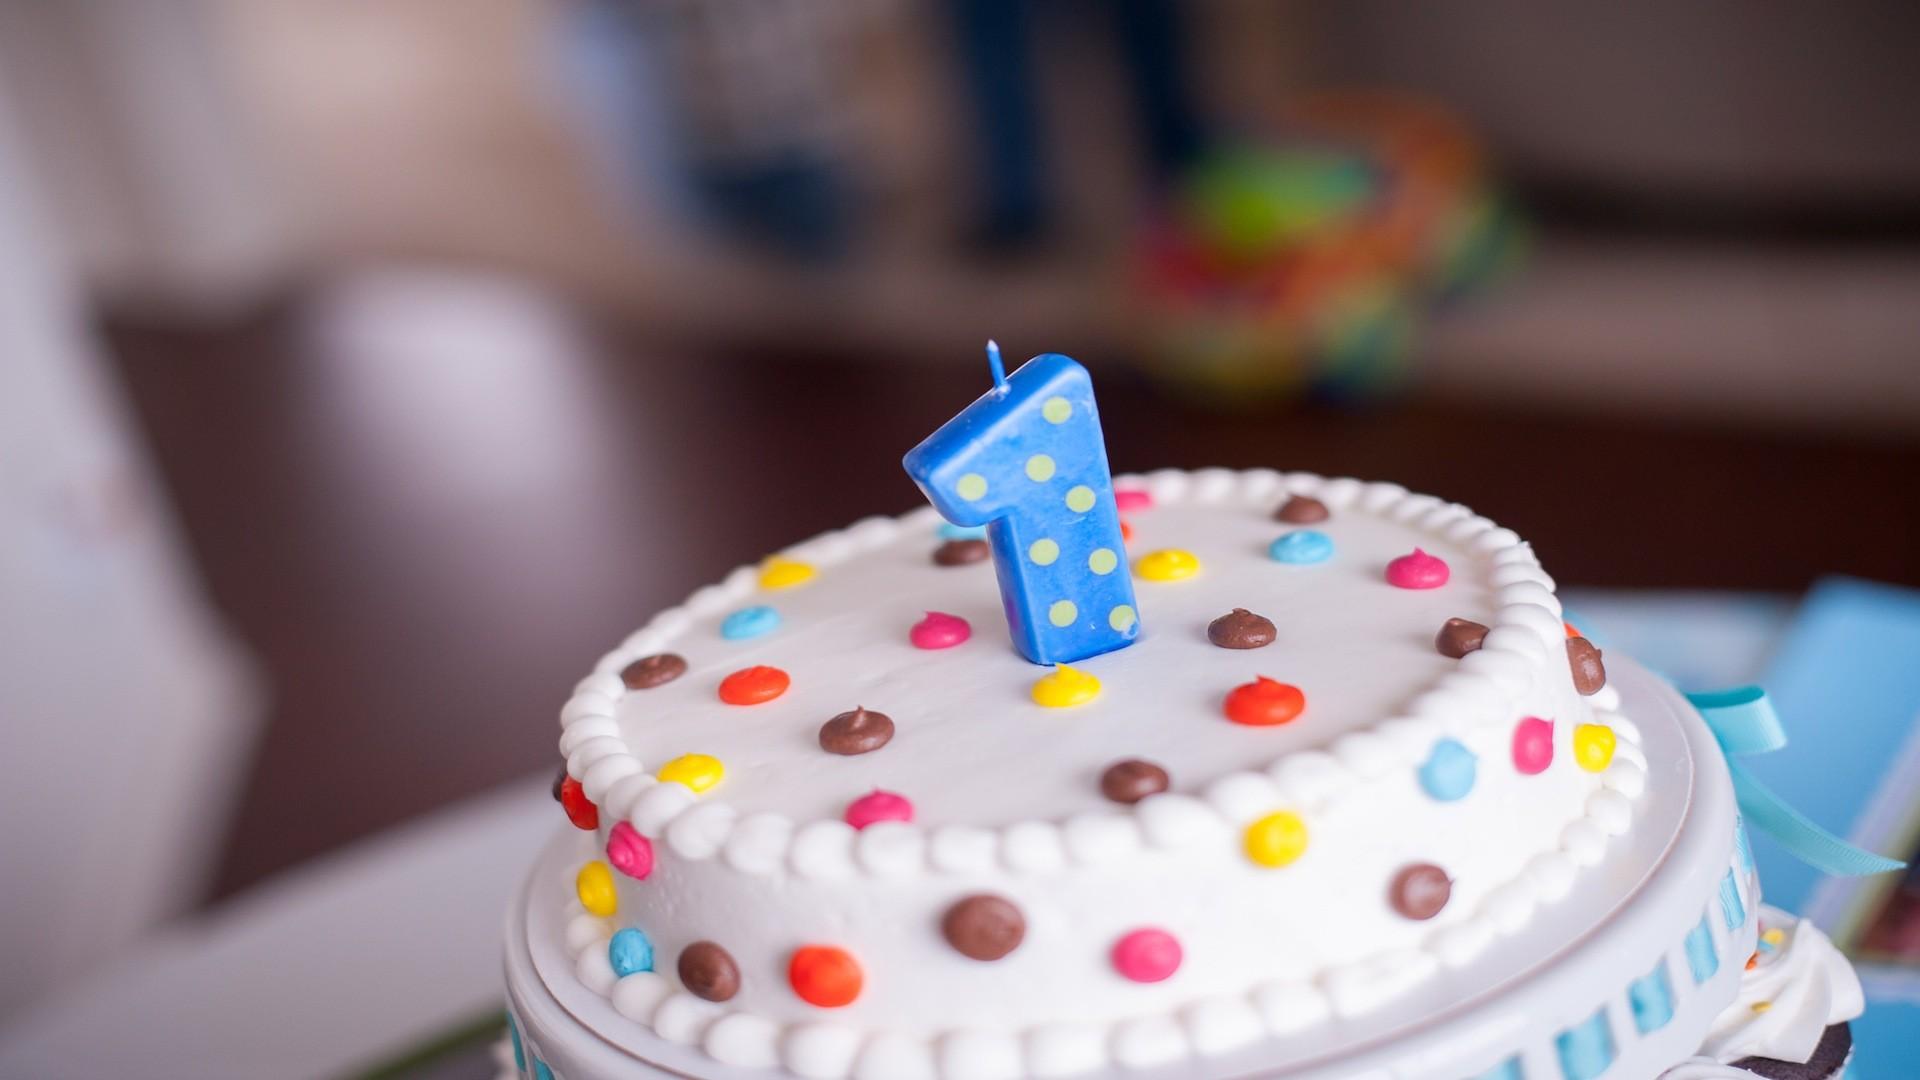 Birthday Cake hd image